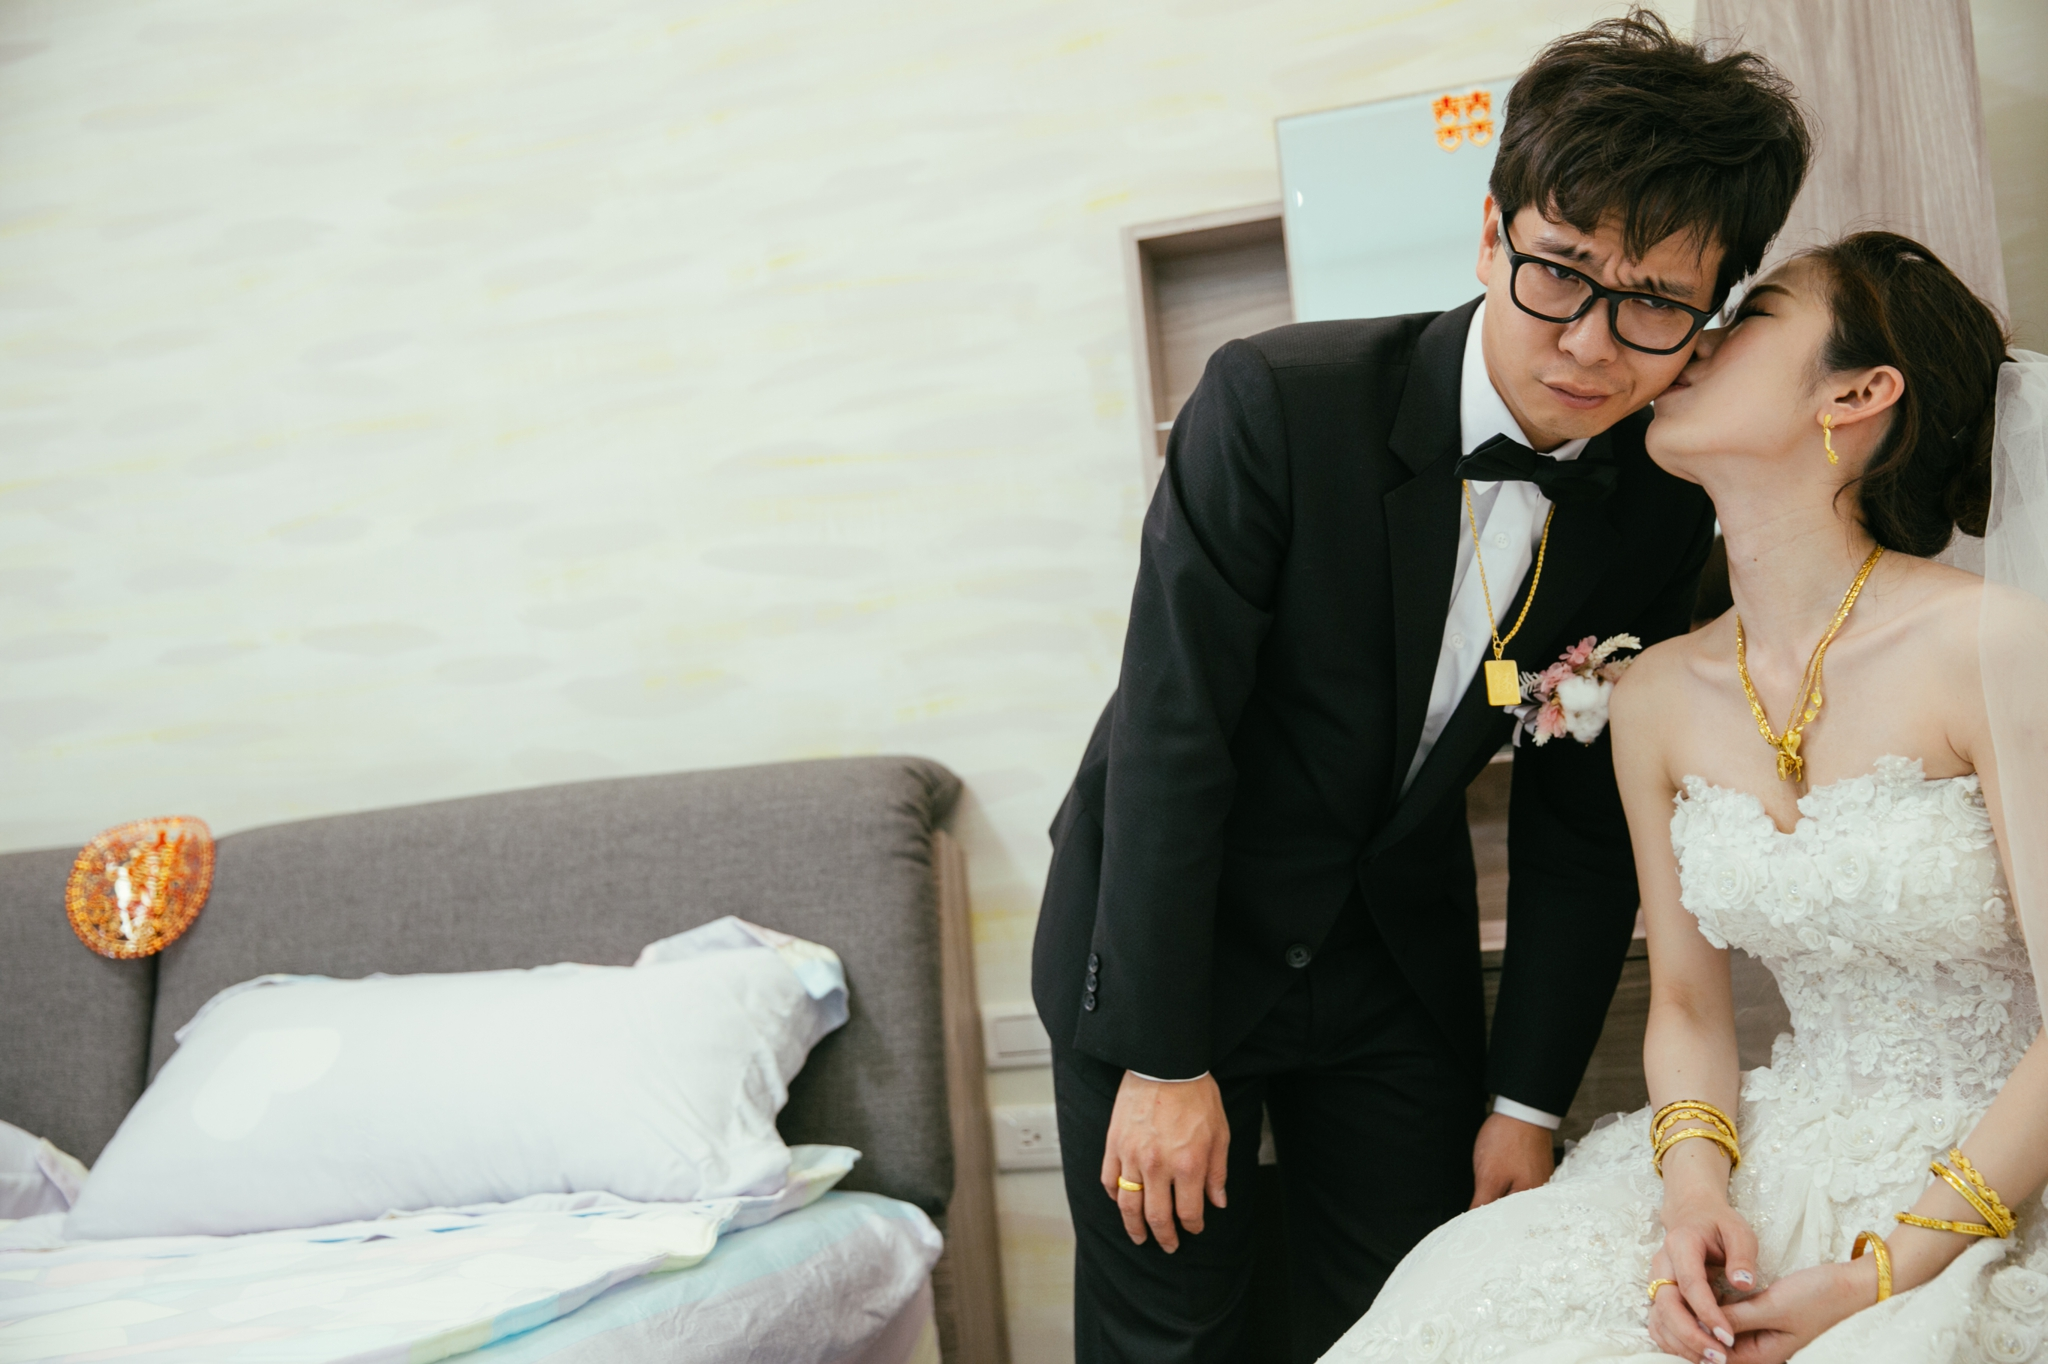 Tina+Nash-wedding-台北婚禮迎娶晚宴-新莊終身大事-096.jpg